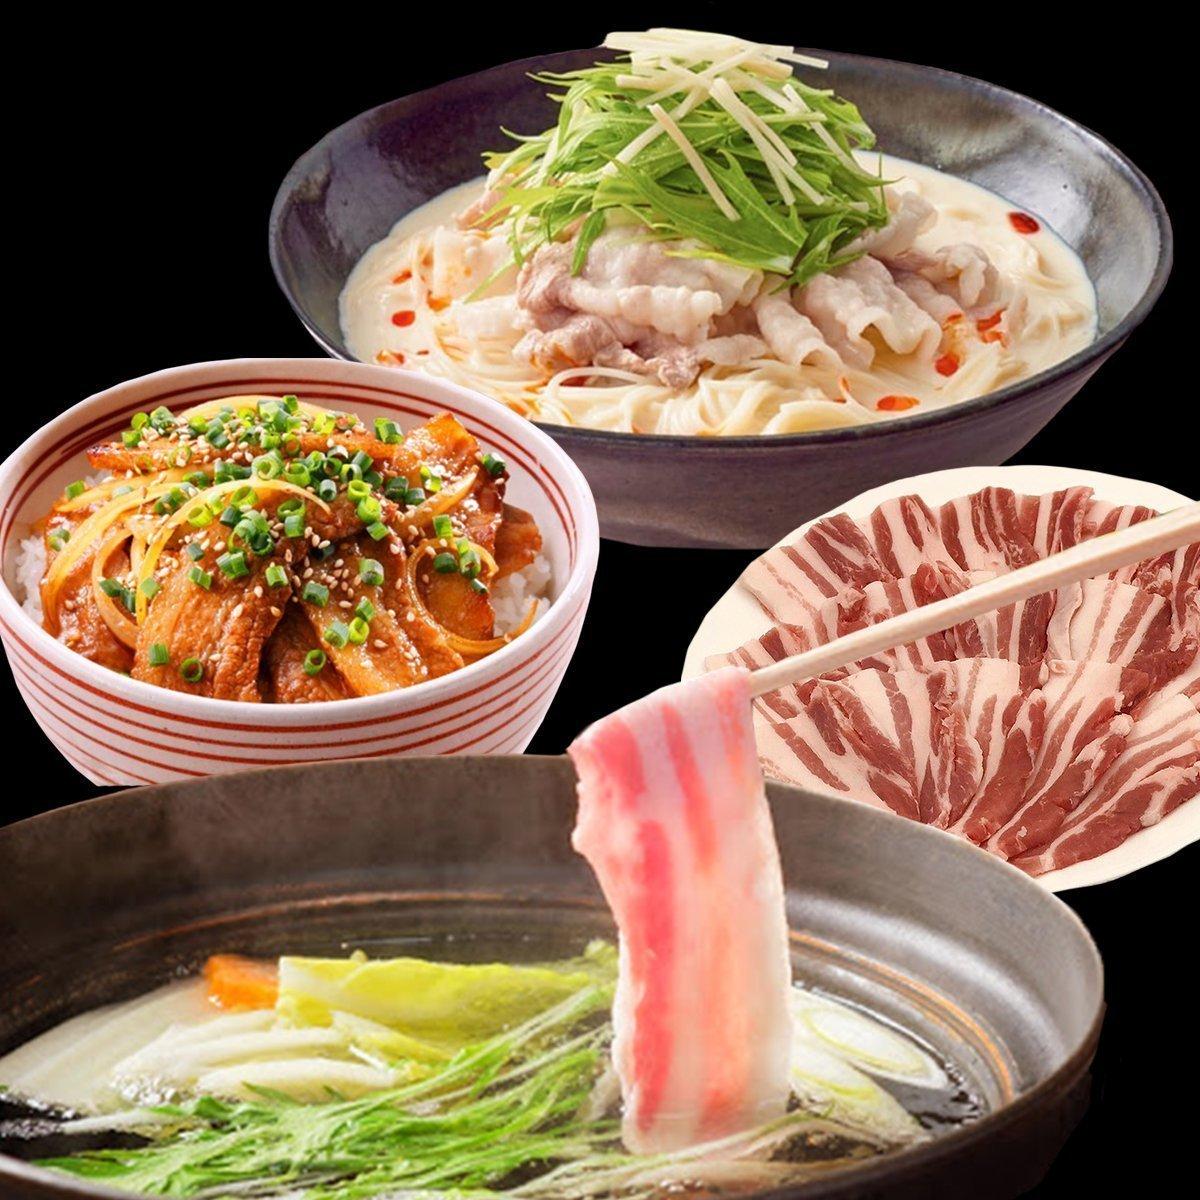 【 ♪ POPULAR】Kagoshima Pork Belly Slices (0.2cm) / 鹿児島産豚バラ肉スライス (0.2cm) フィルムが敷いてあって便利♪